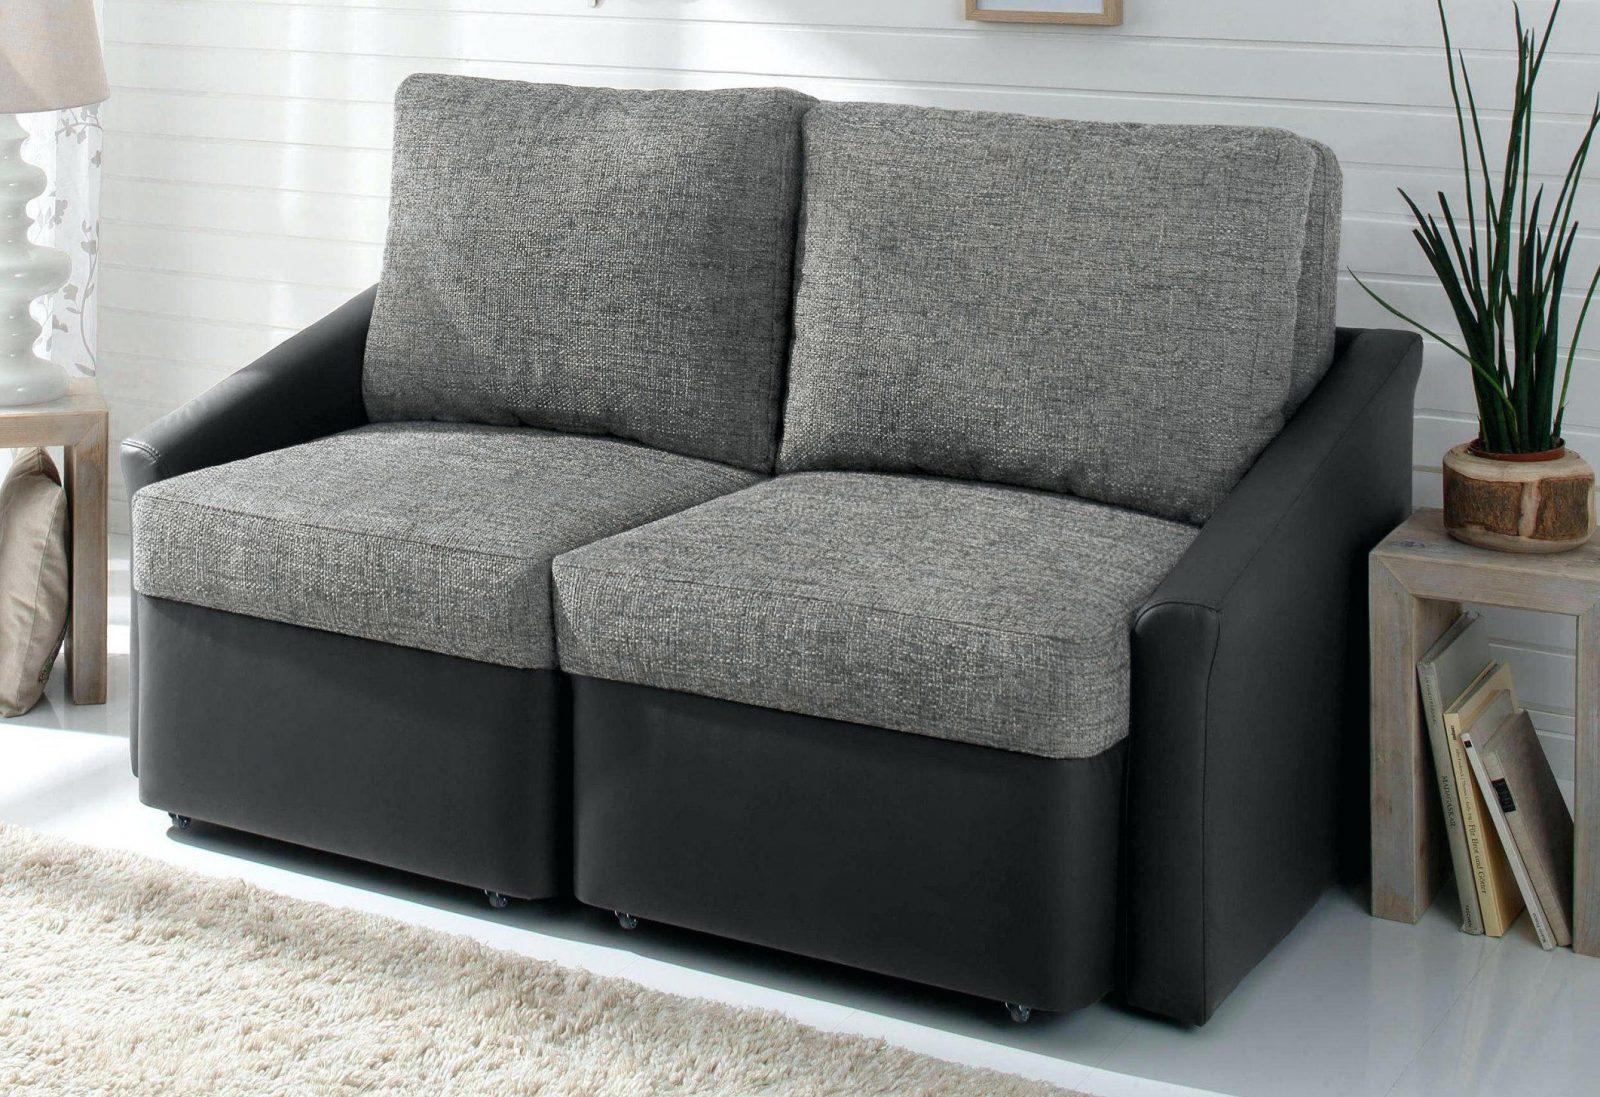 3 Sitzer Sofa Poco Couch Poco Cool Big Couch Poco Sofa Sofas Xxl Ga von 3 Sitzer Sofa Poco Bild